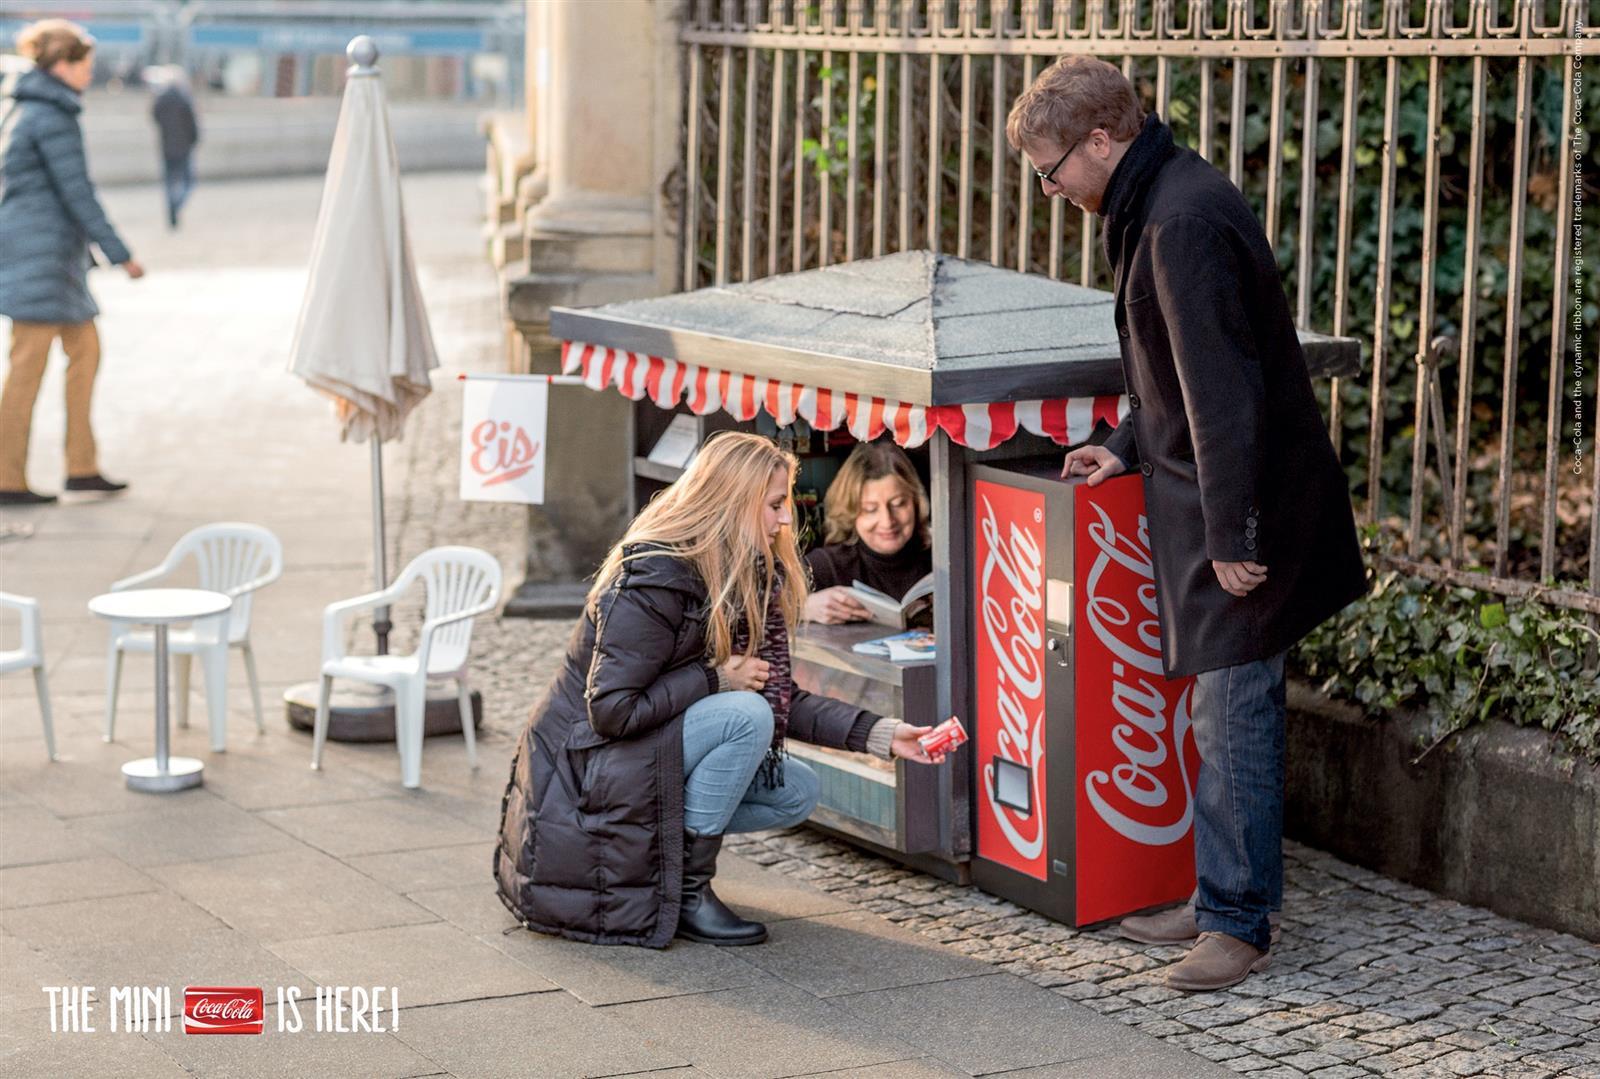 Coca-Cola Mini Kiosk (2)